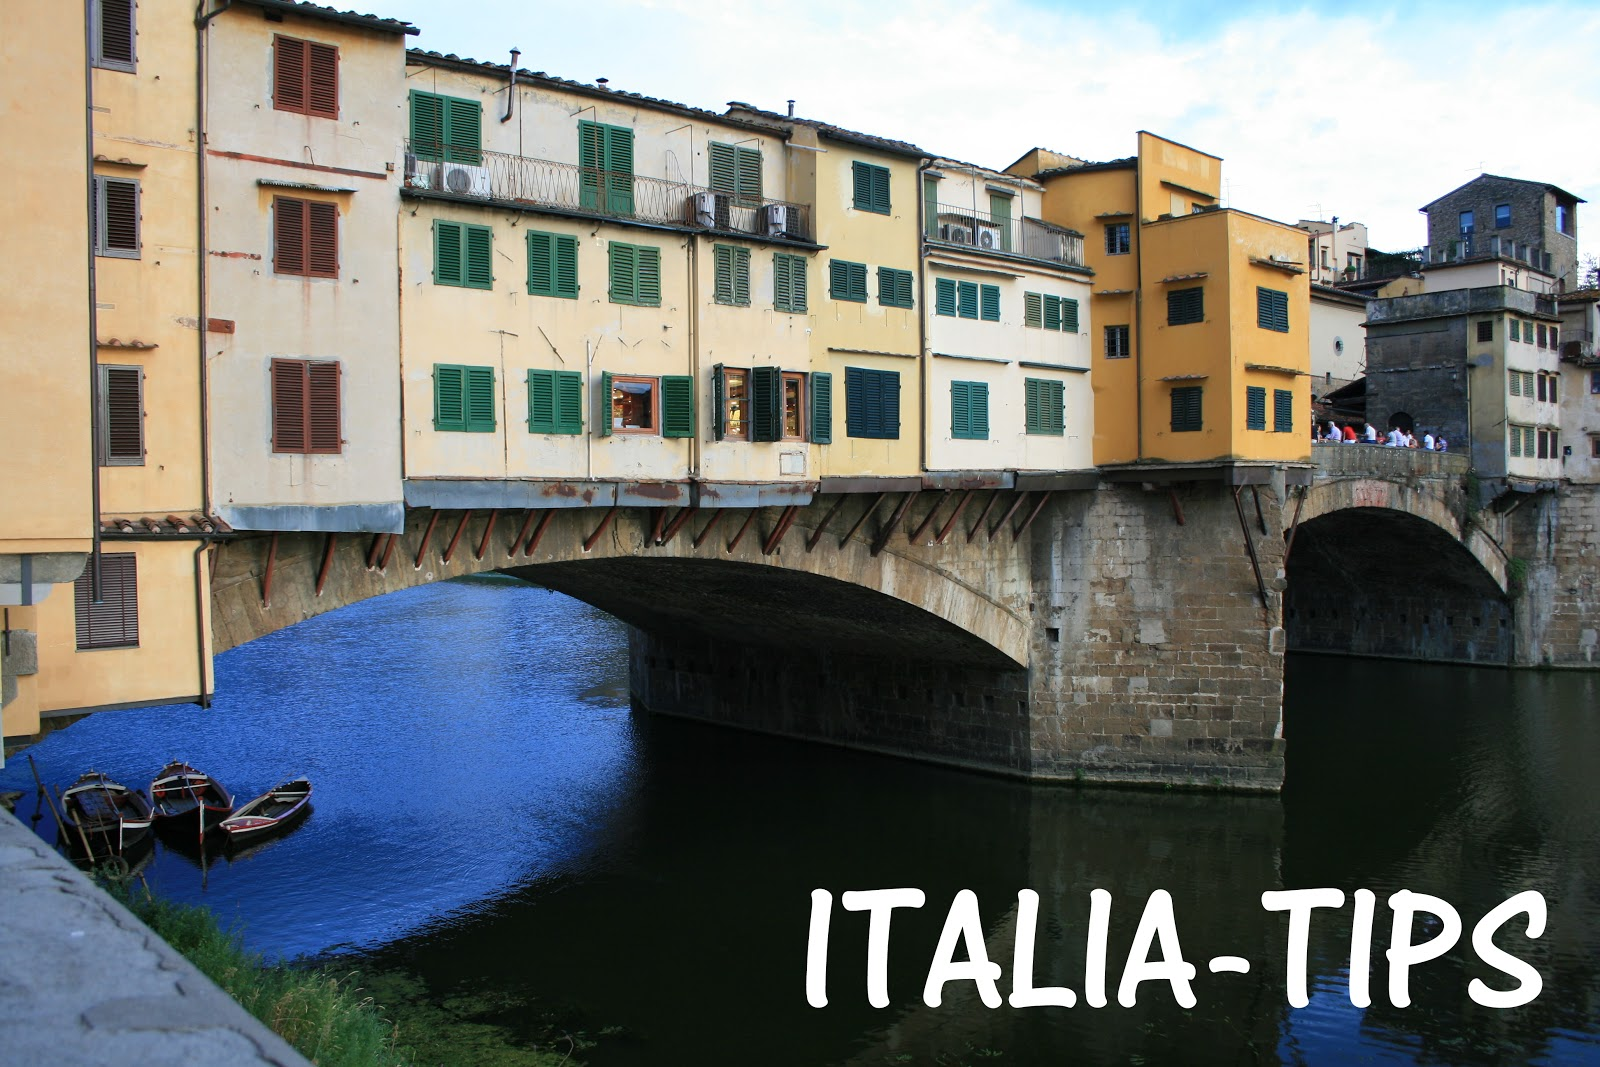 Leie hus i italia tips